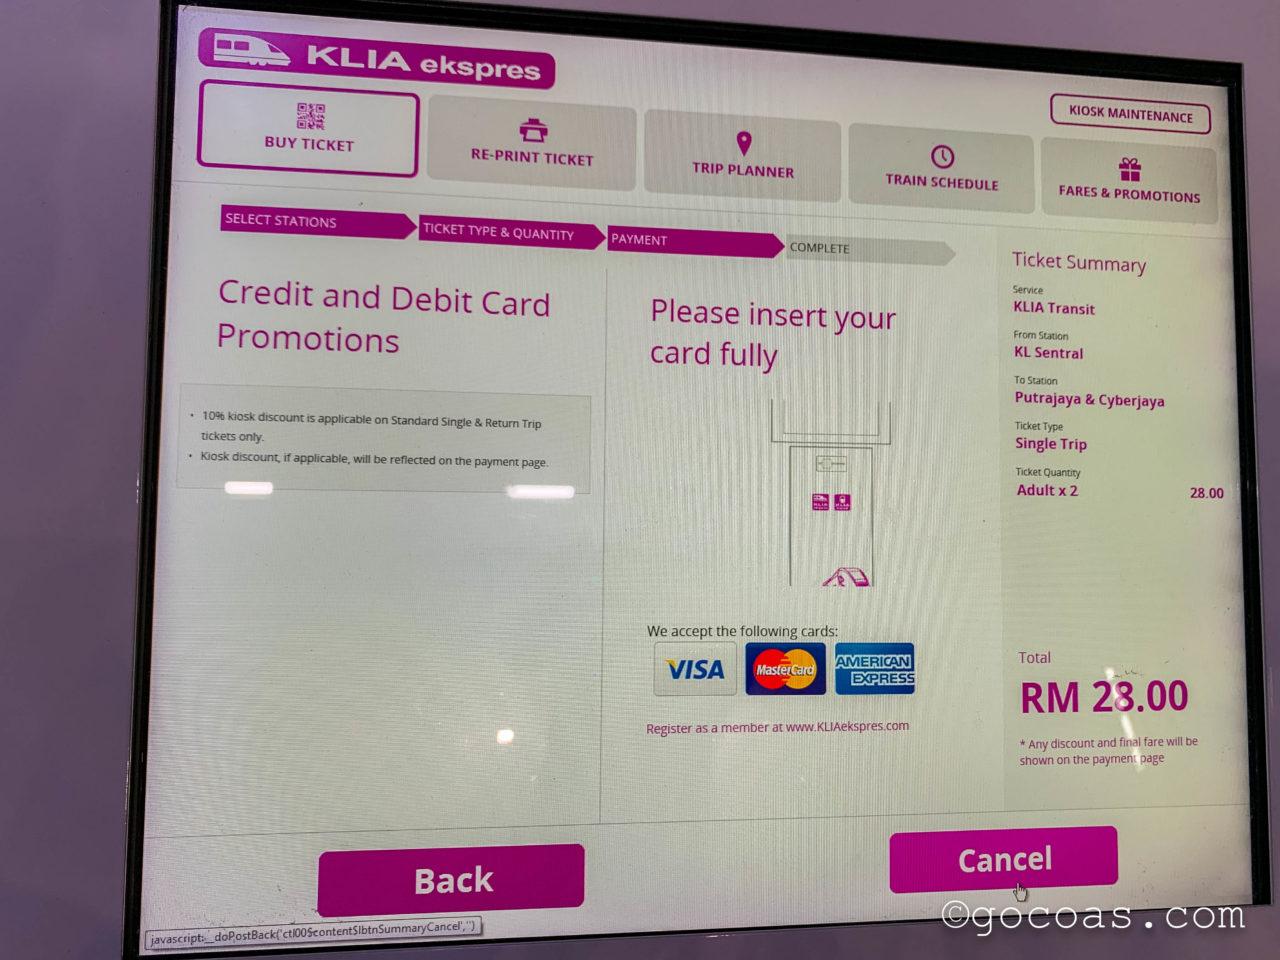 KLセントラル駅構内の鉄道チケットの購入画面